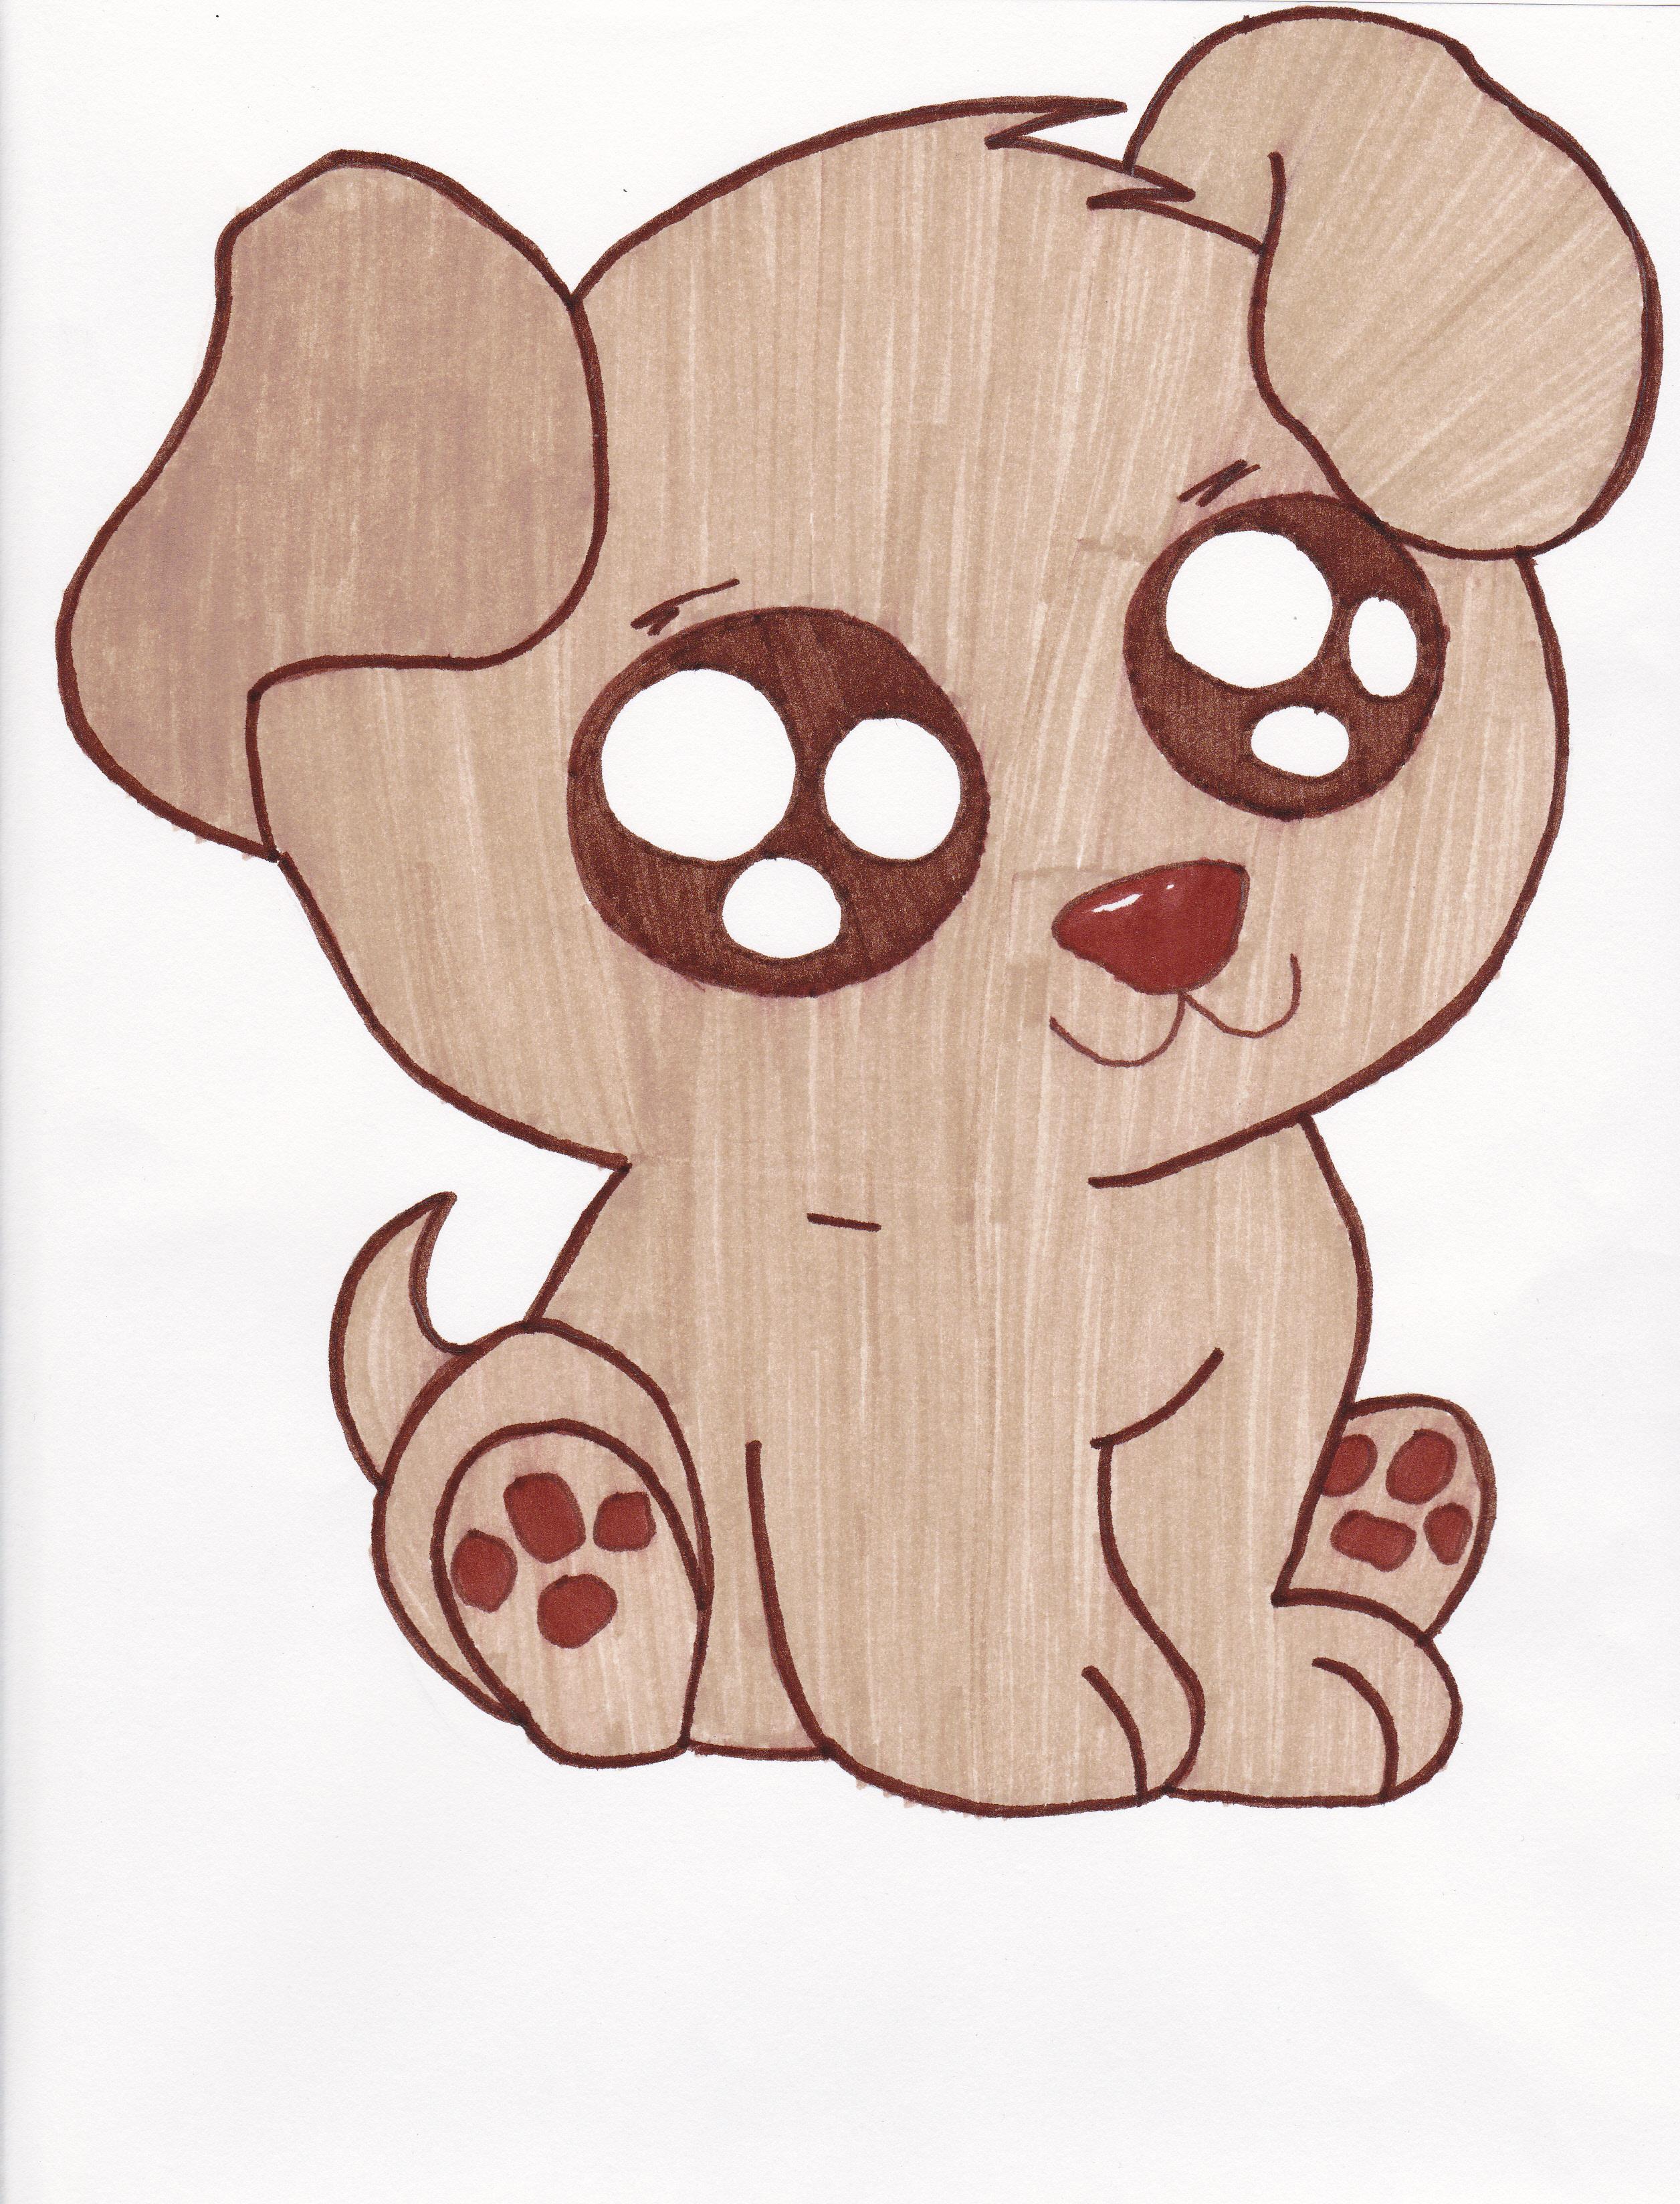 Free Cute Cartoon Puppies, Download Free Clip Art, Free Clip.